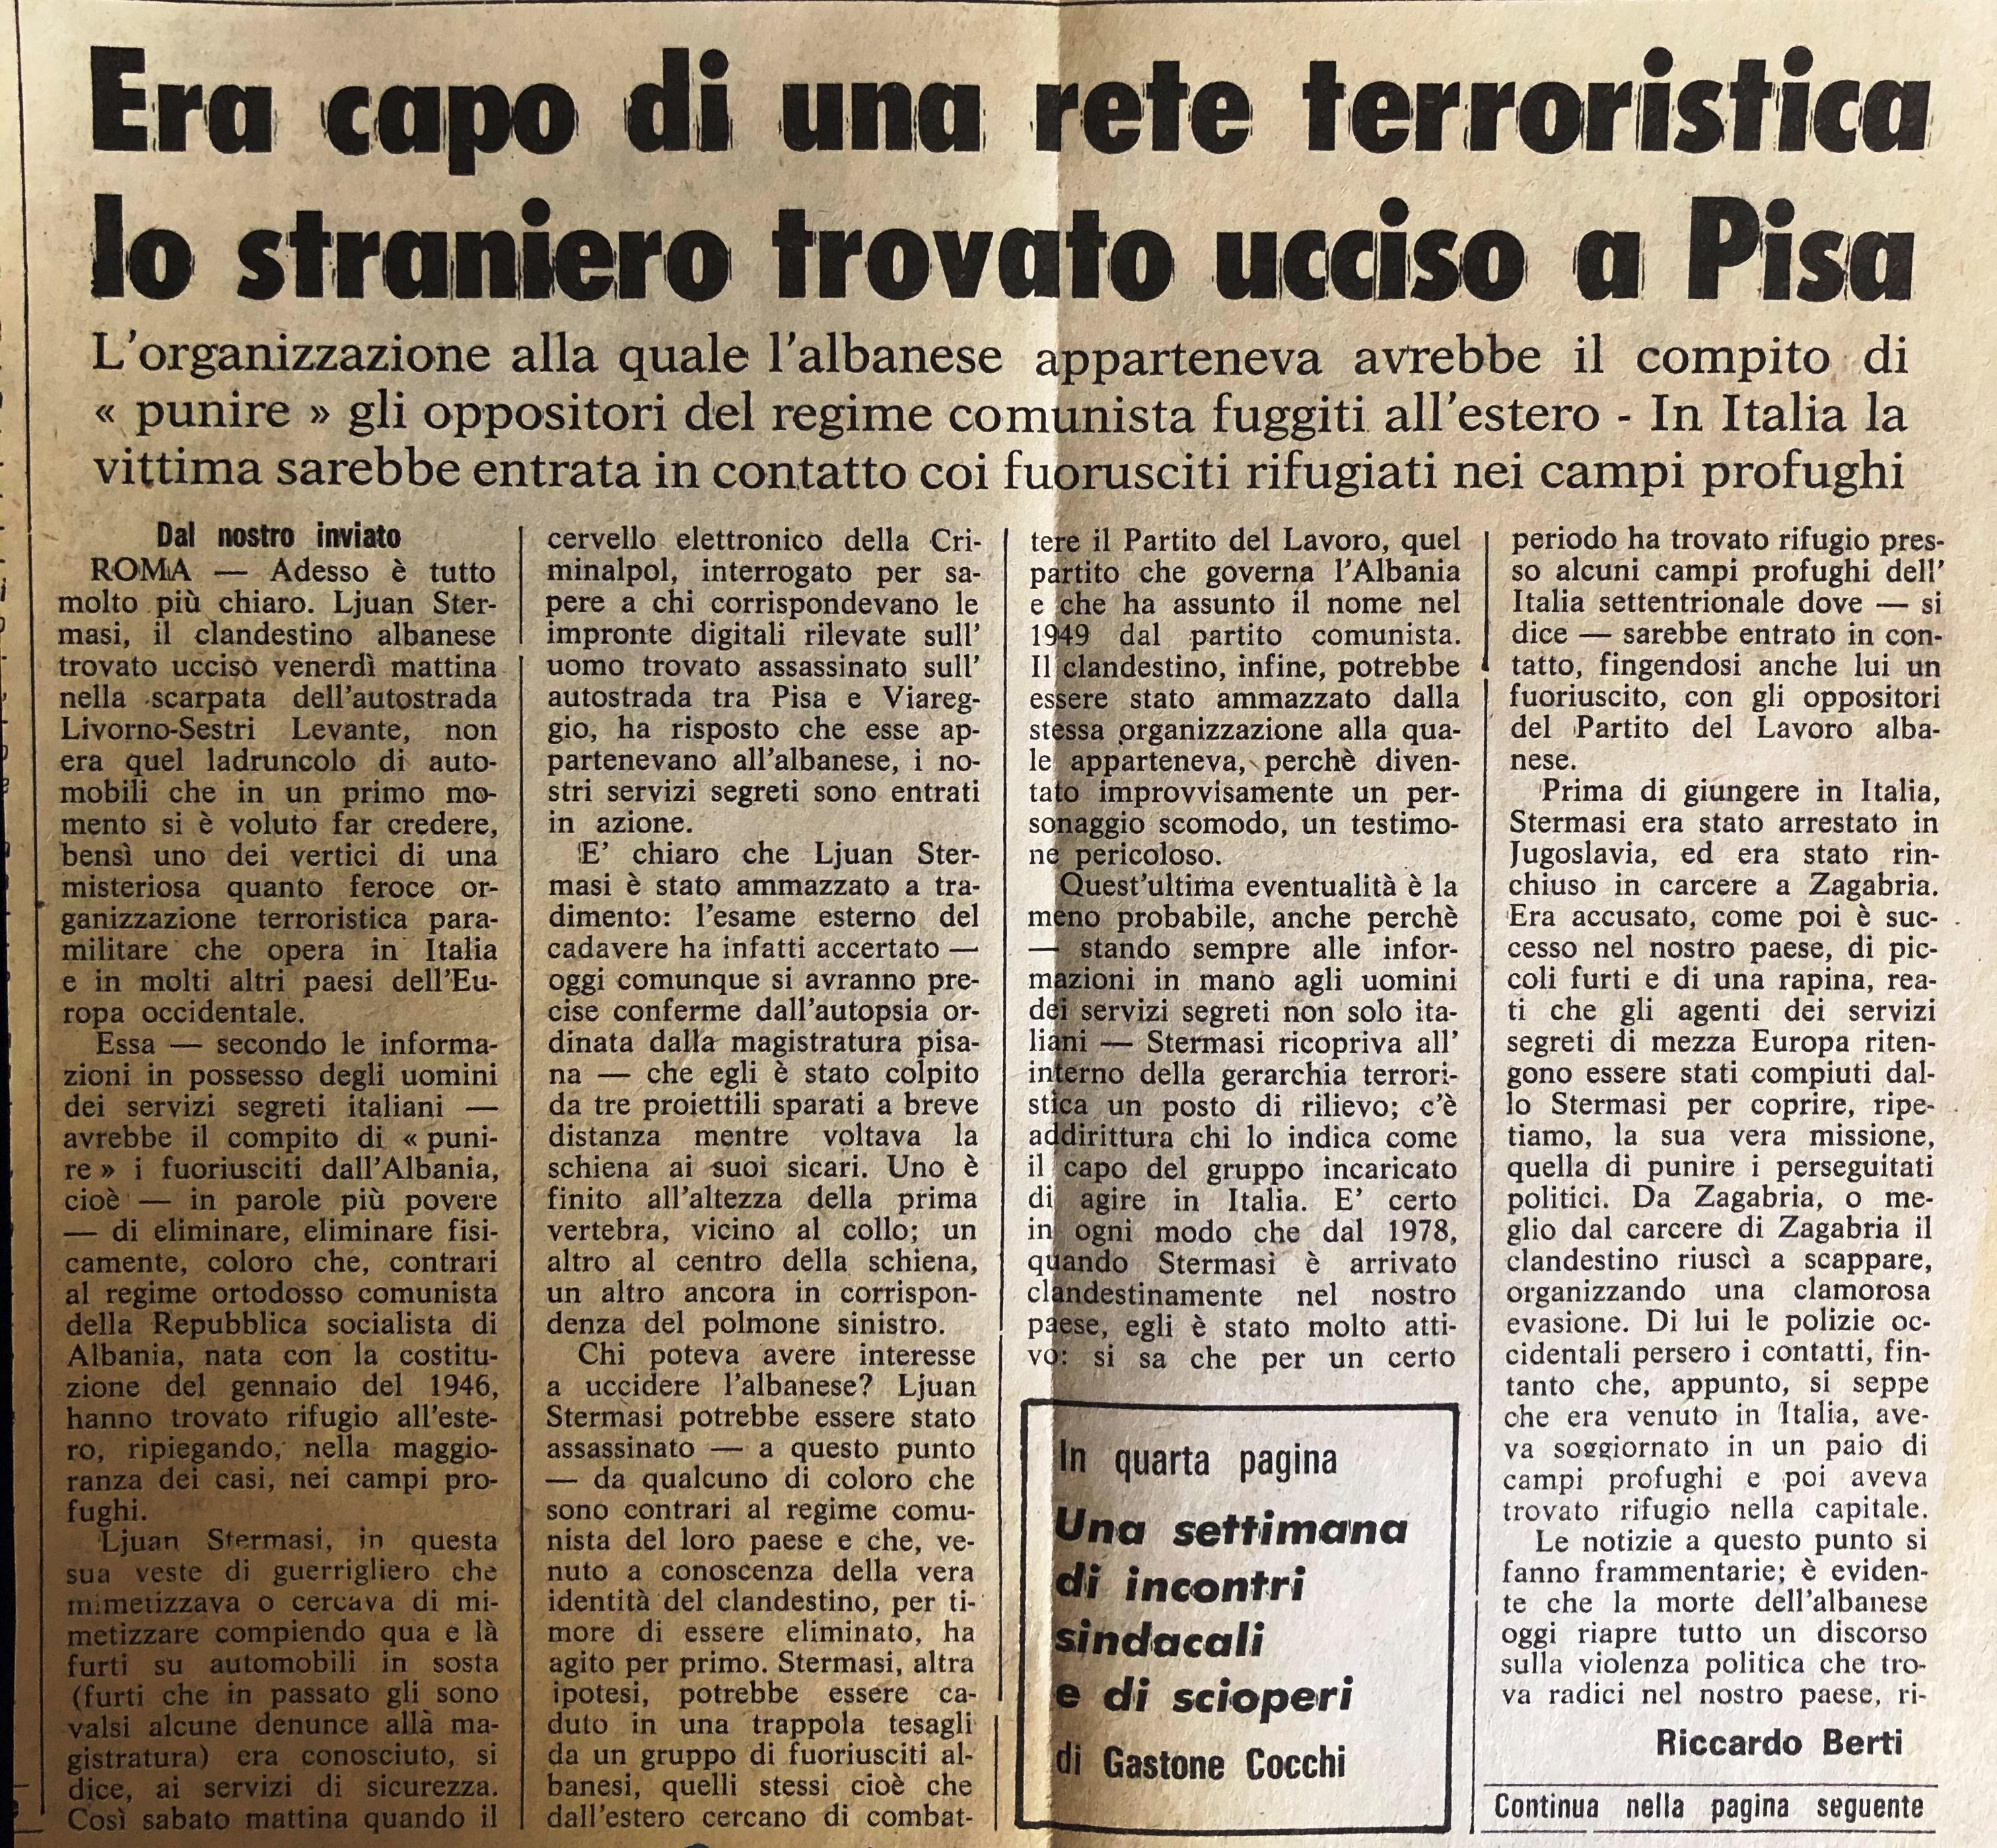 La Nazione di Firenze, 8 ottobre 1979 fq. 1,2